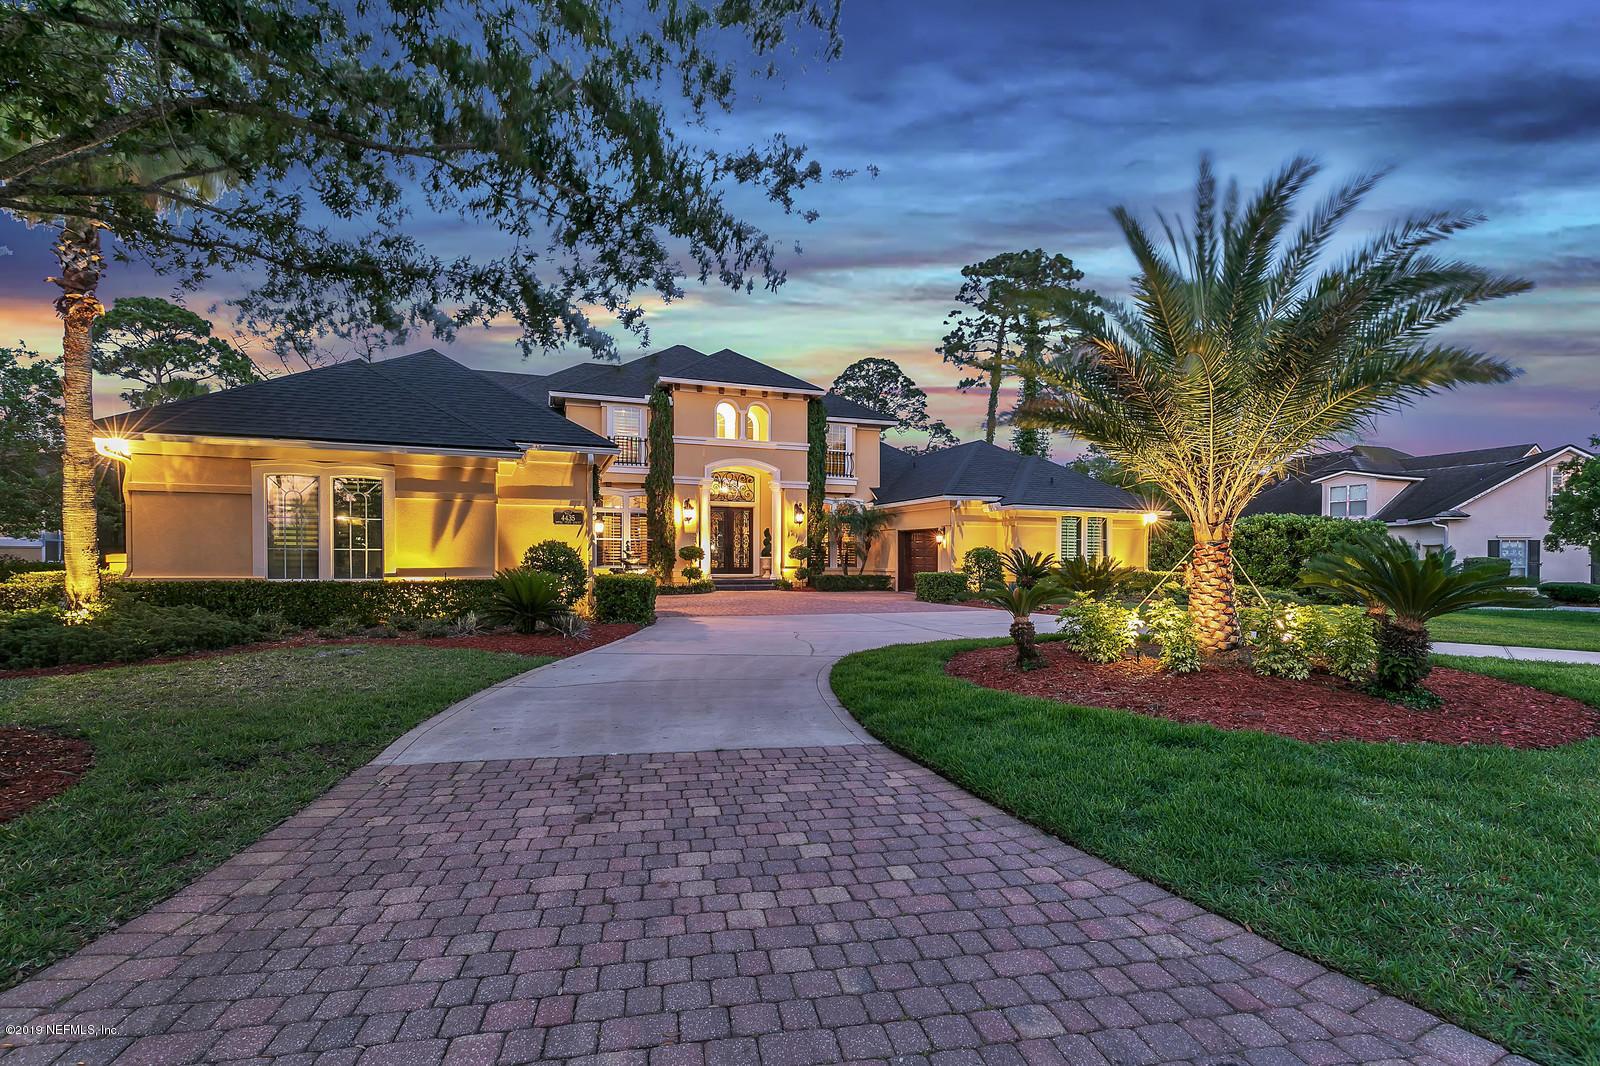 4435 ROYAL TERN, JACKSONVILLE BEACH, FLORIDA 32250, 5 Bedrooms Bedrooms, ,5 BathroomsBathrooms,Residential - single family,For sale,ROYAL TERN,997834